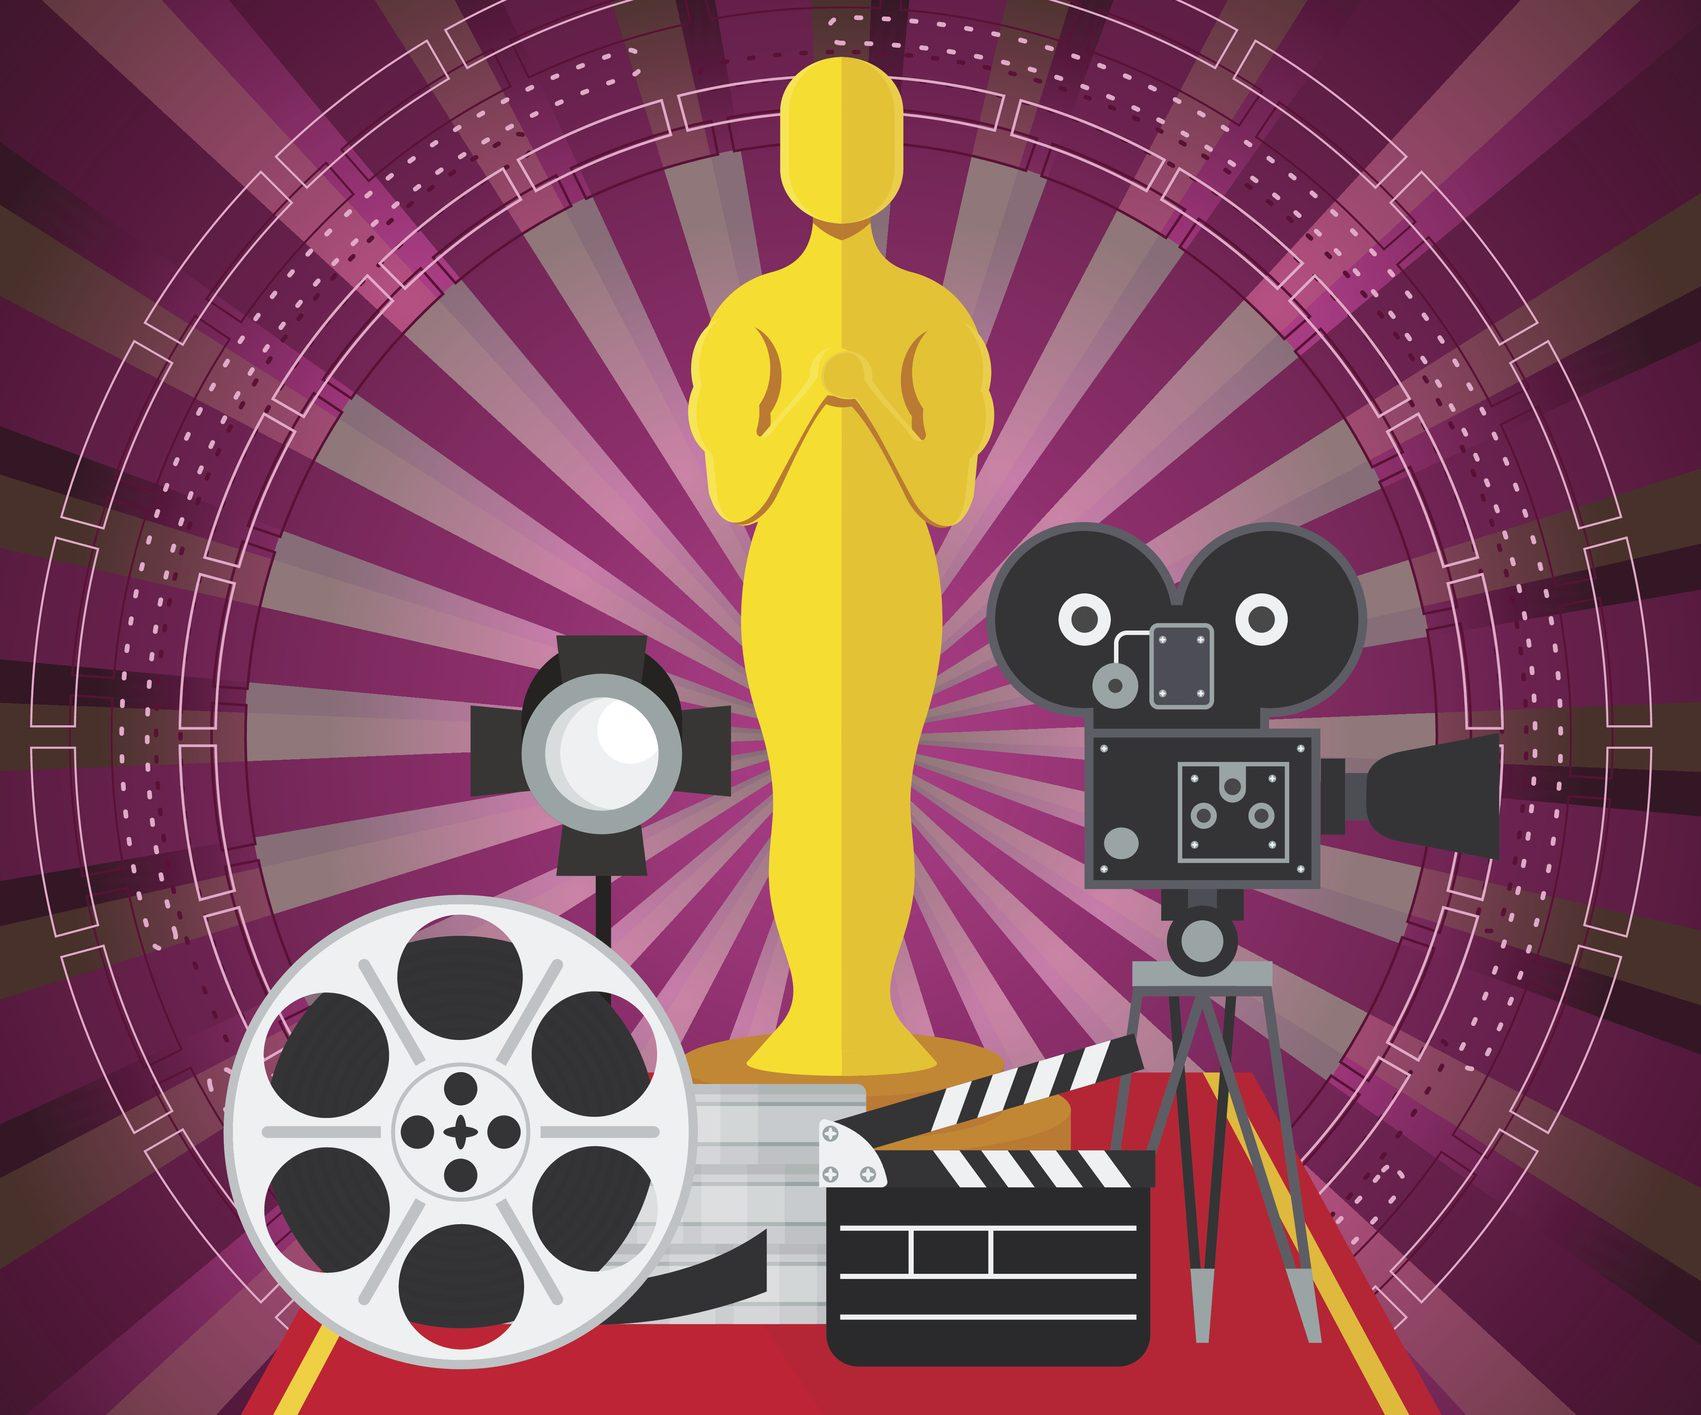 Hollywood A-Listers Publicly Denounce Academy's Latest Oscars Misstep To Cut Four Awards From Live Telecast